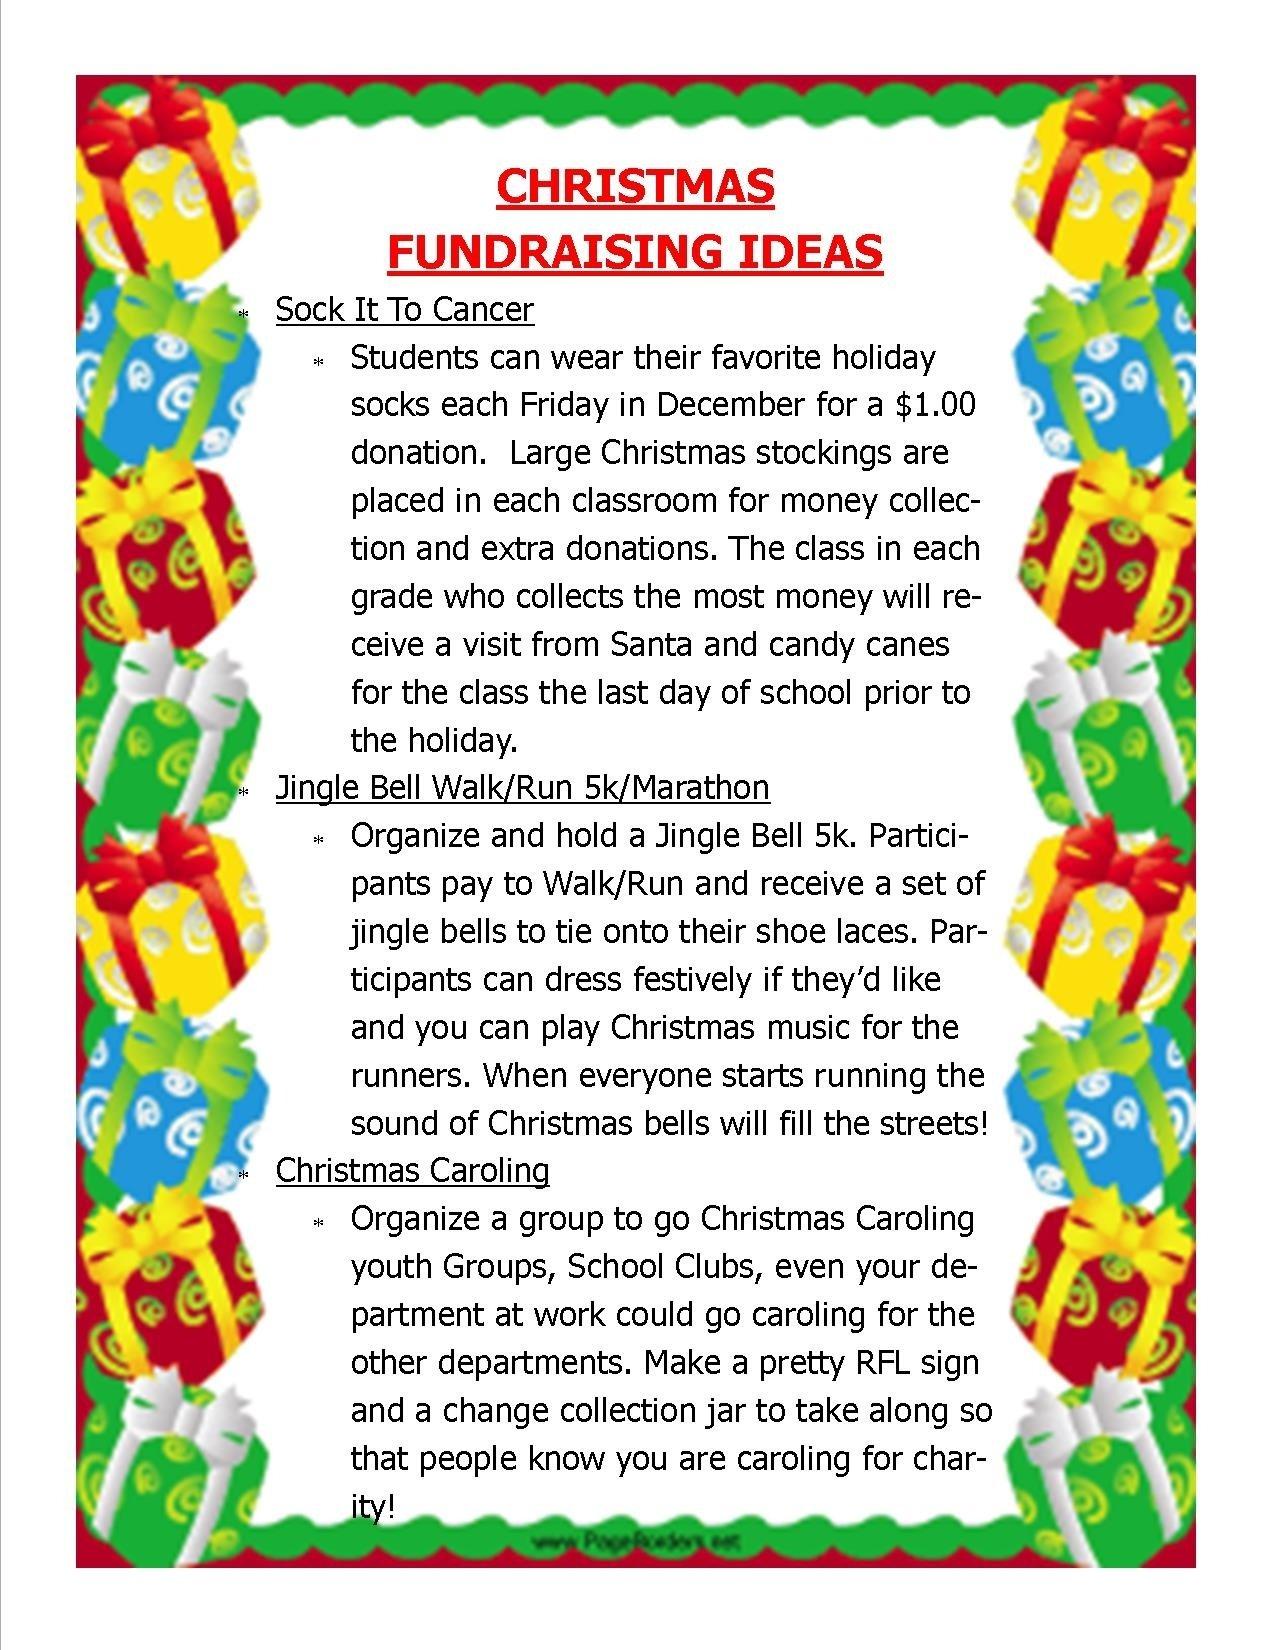 10 Pretty Elementary School Fundraising Ideas That Work relay for life christmas fundraising ideas ccfa take steps 2 2020